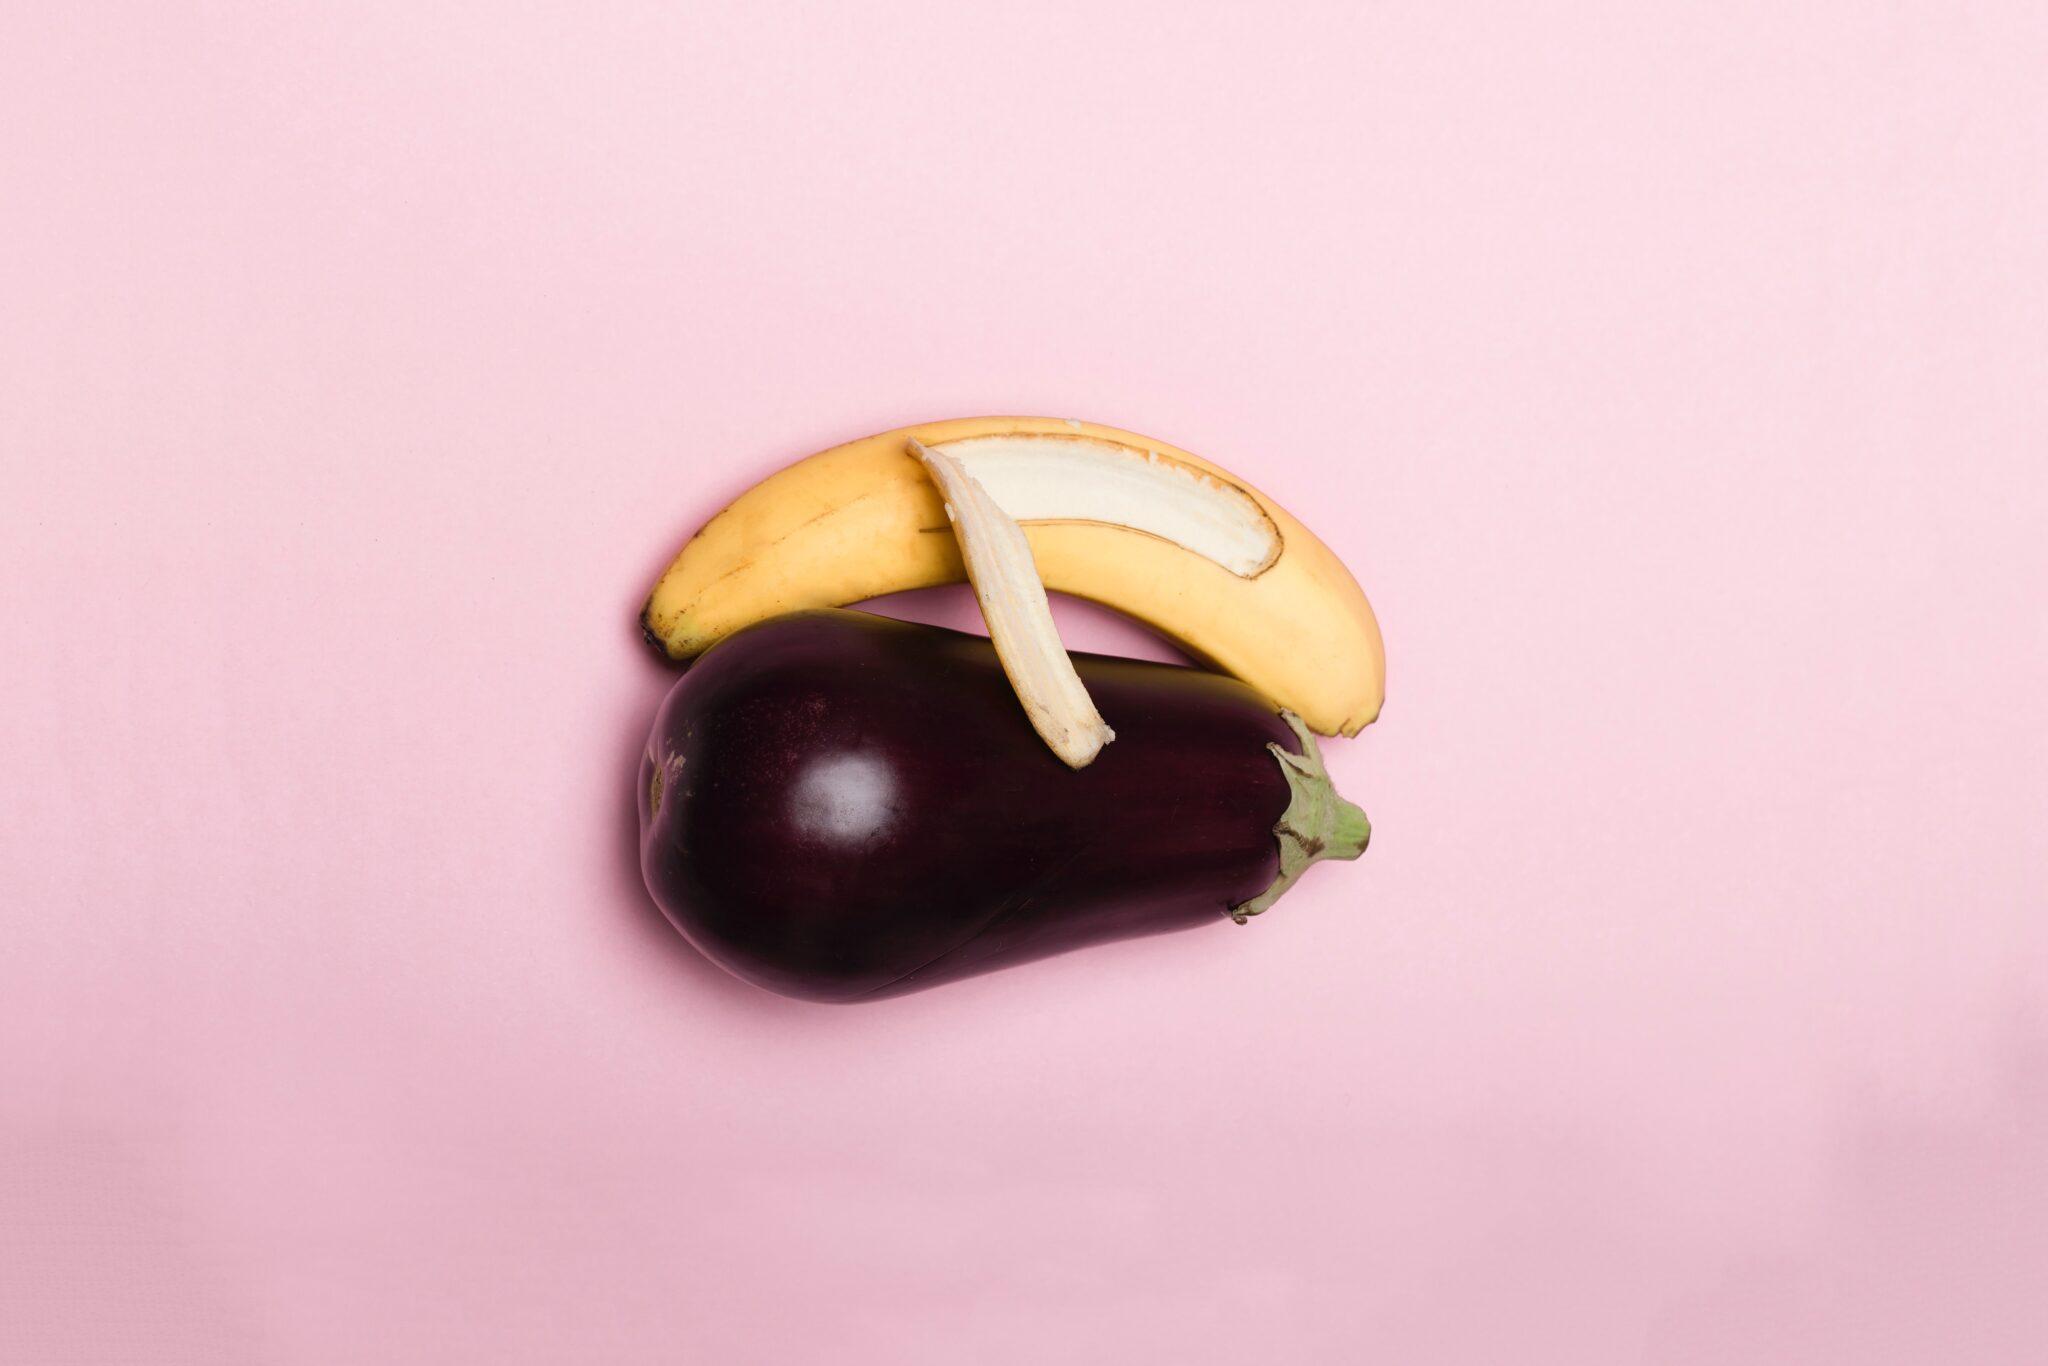 banana e melanzana rappresentano l'amore omosessuale